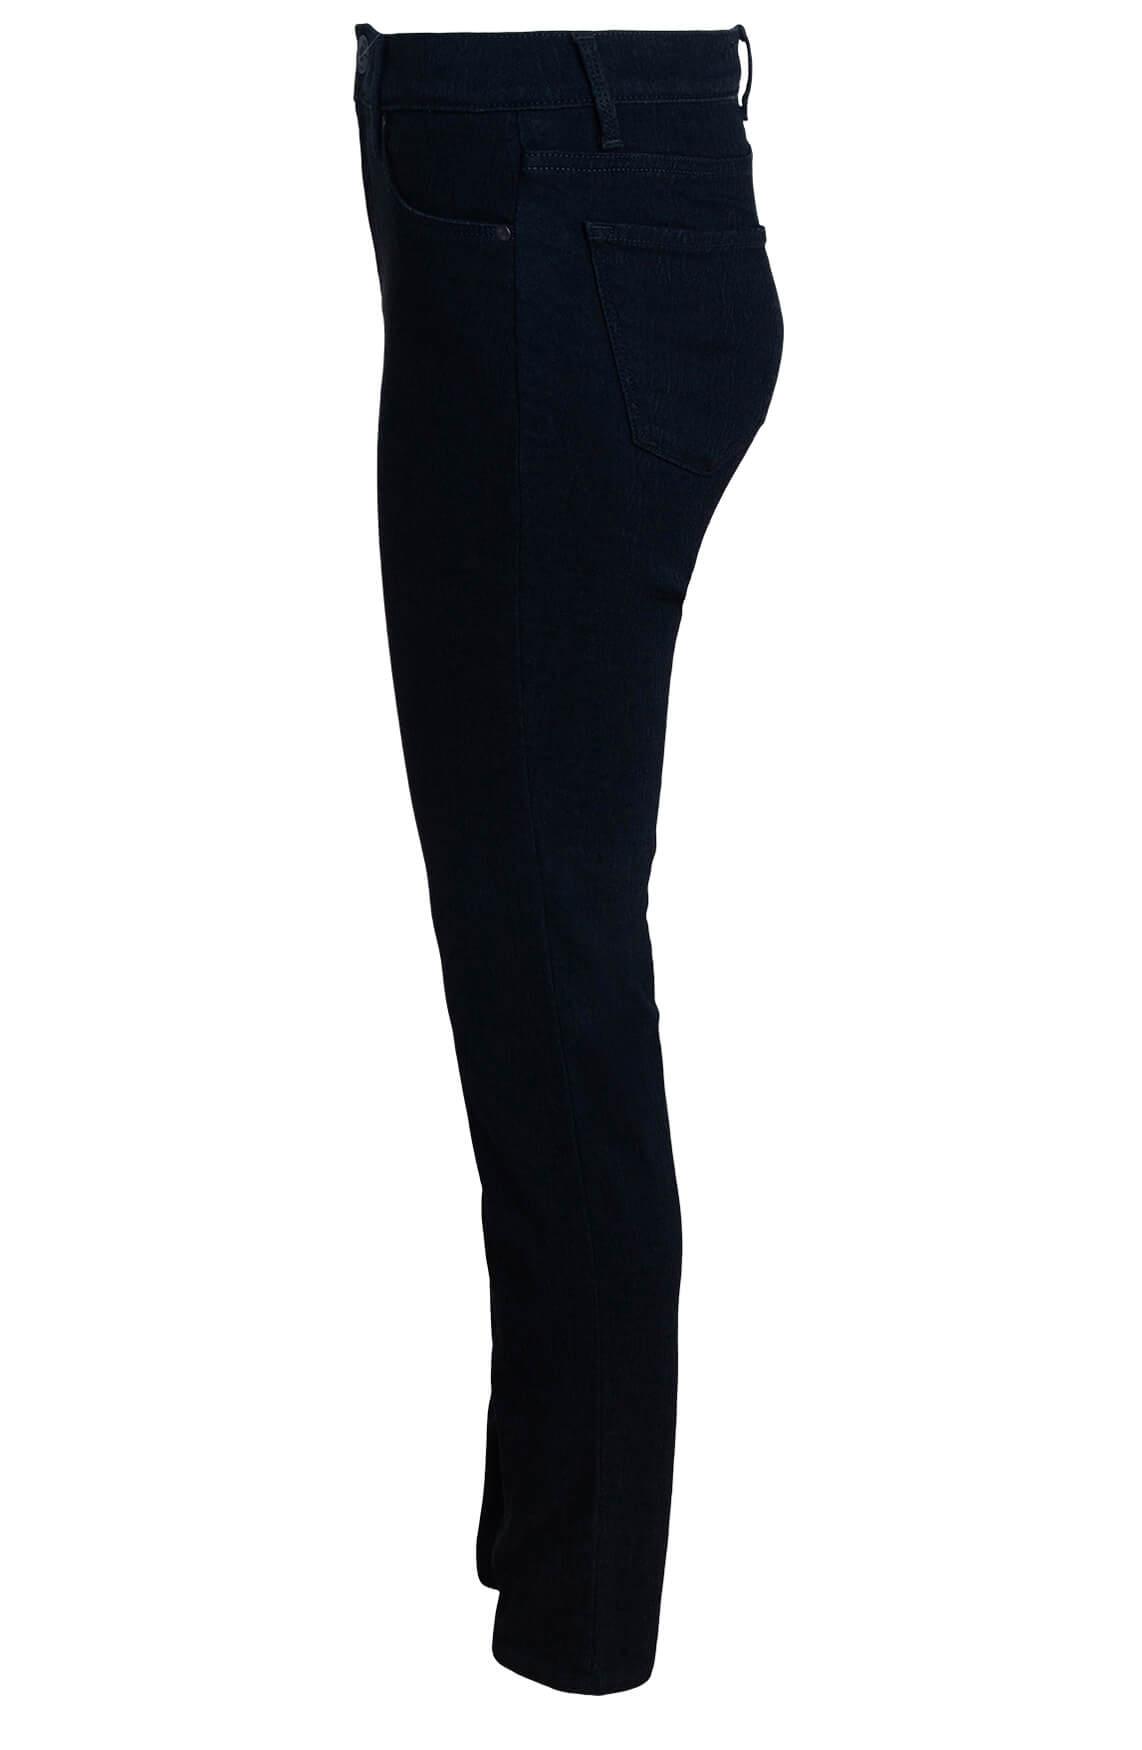 Brax Dames Shakira jacquard broek Blauw